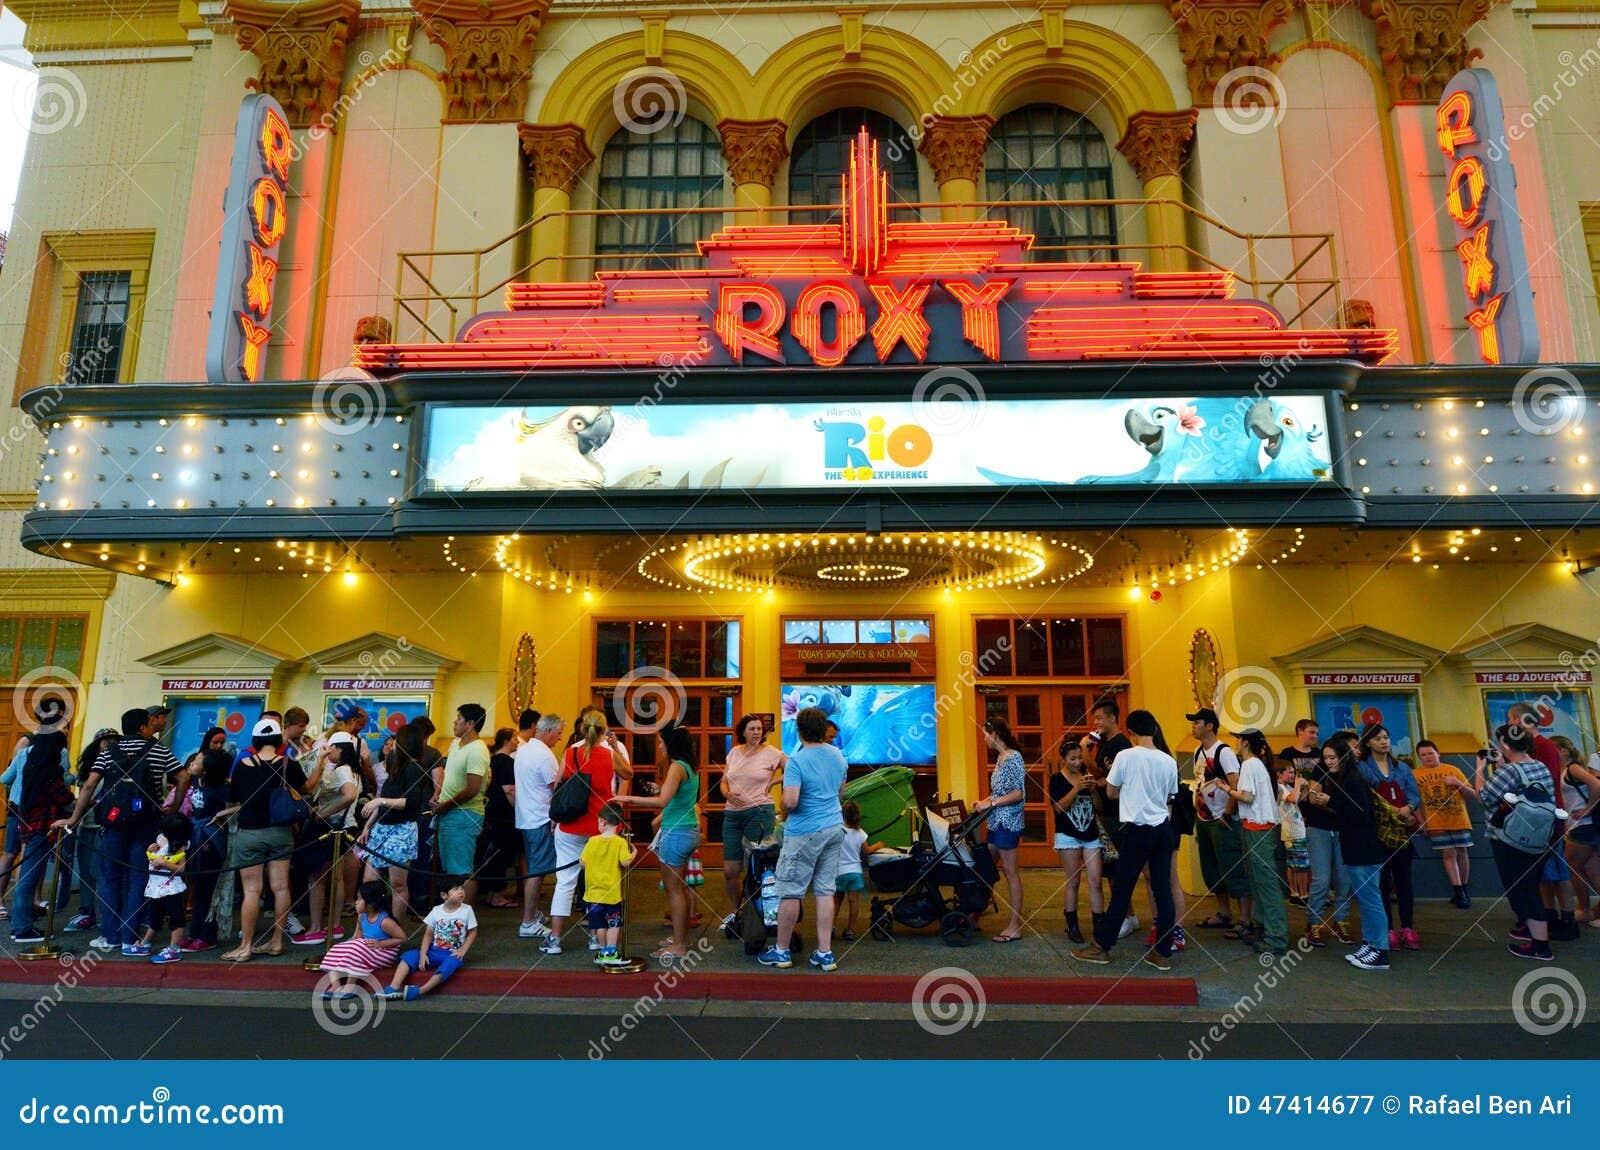 Date movie full movie in Brisbane